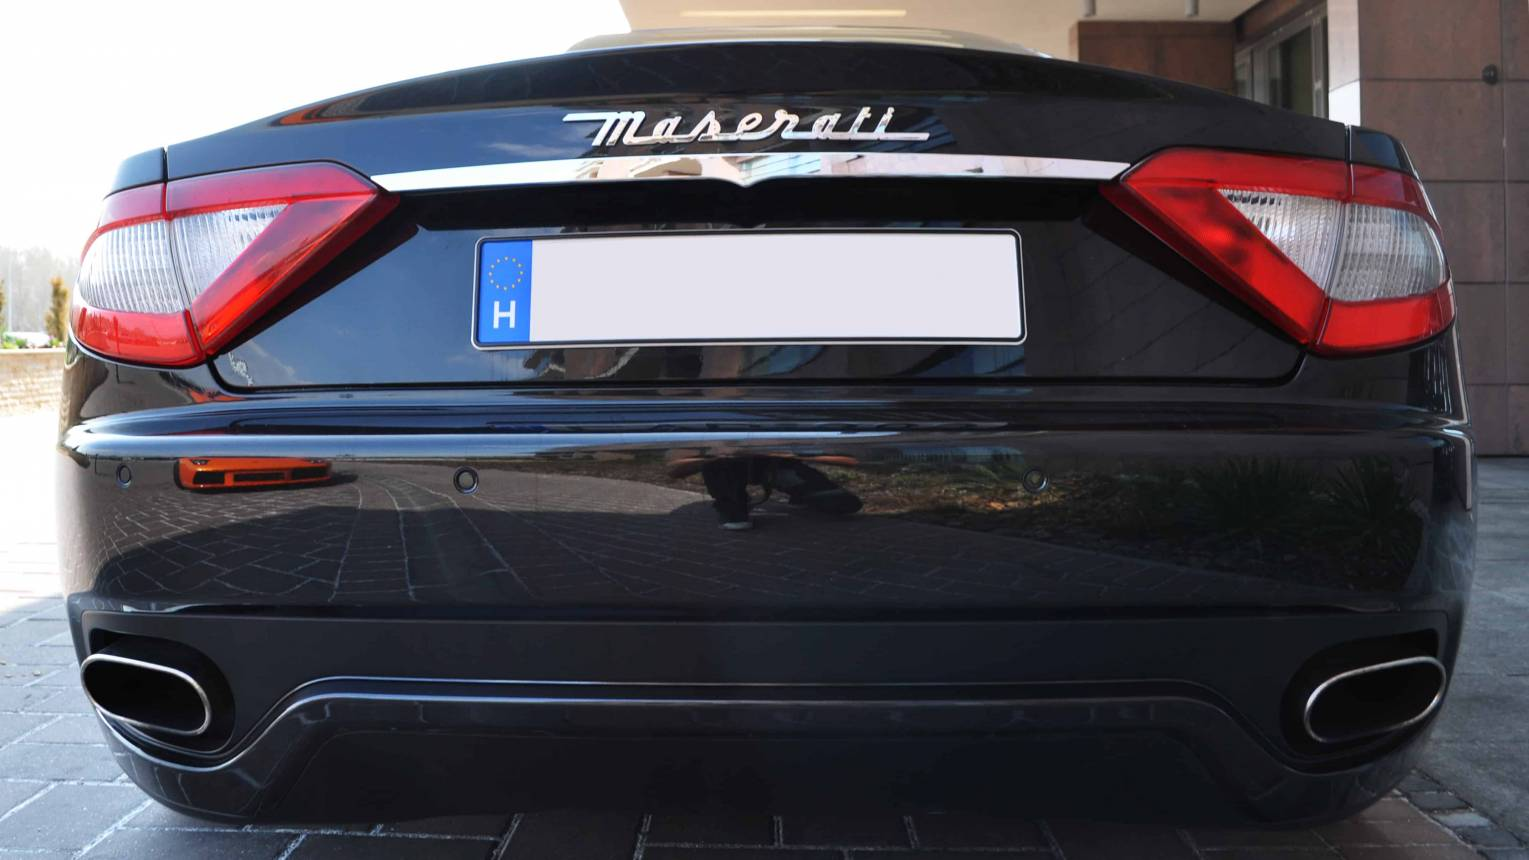 Maserati GT S utcai vezetés